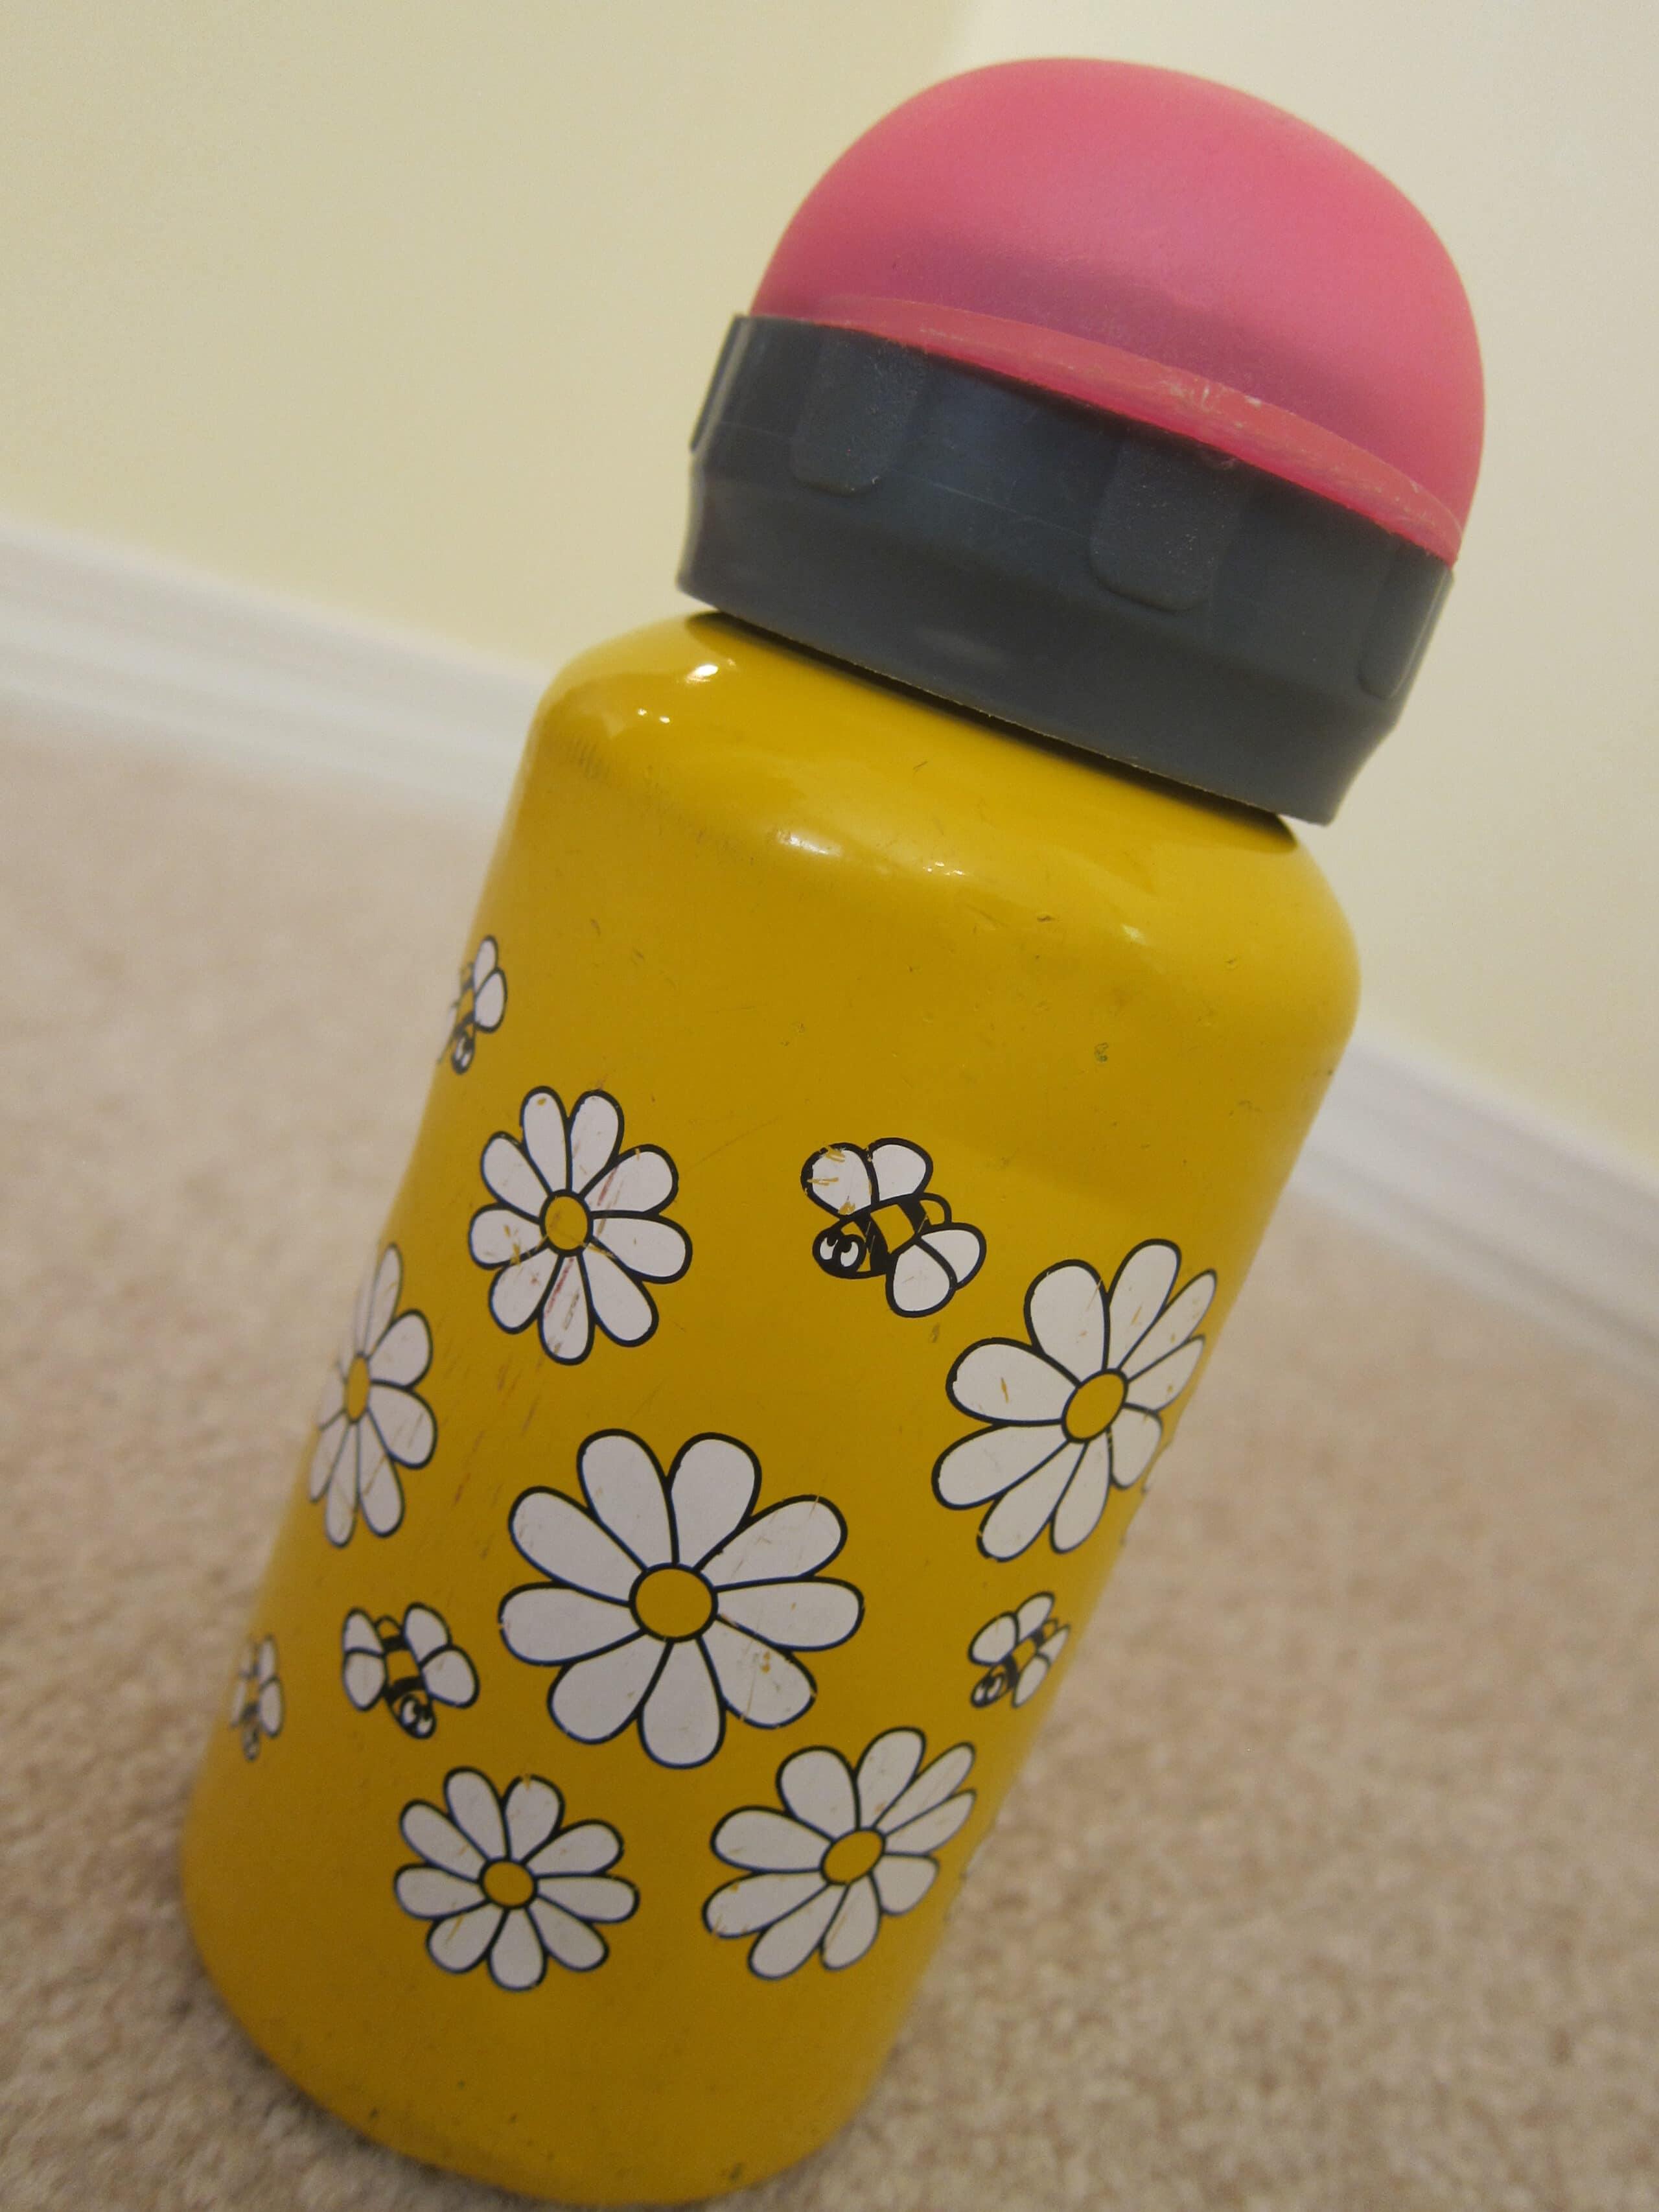 WASHINGTON, USA: The Girly Water Bottle